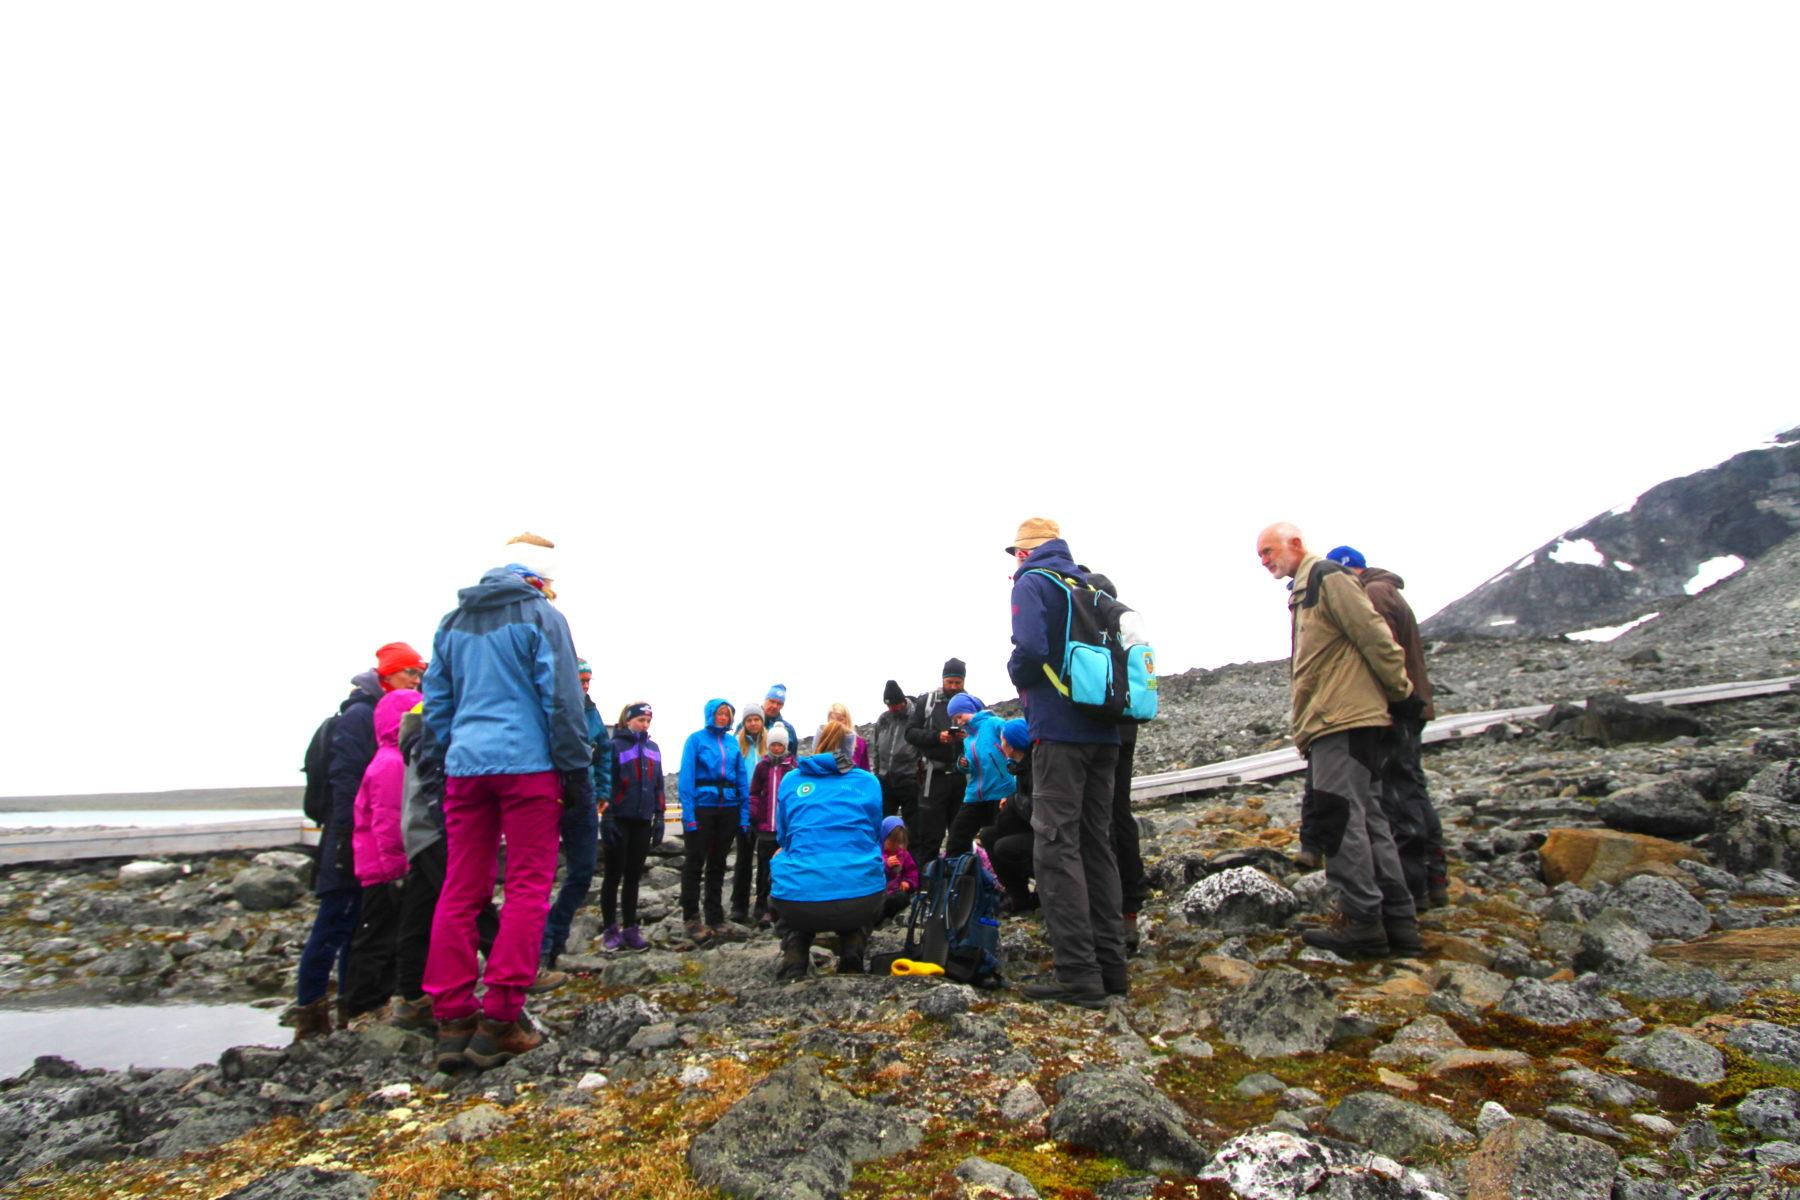 Guided tour of Klimapark 2469 and the ice tunnel near Galdhøpiggen